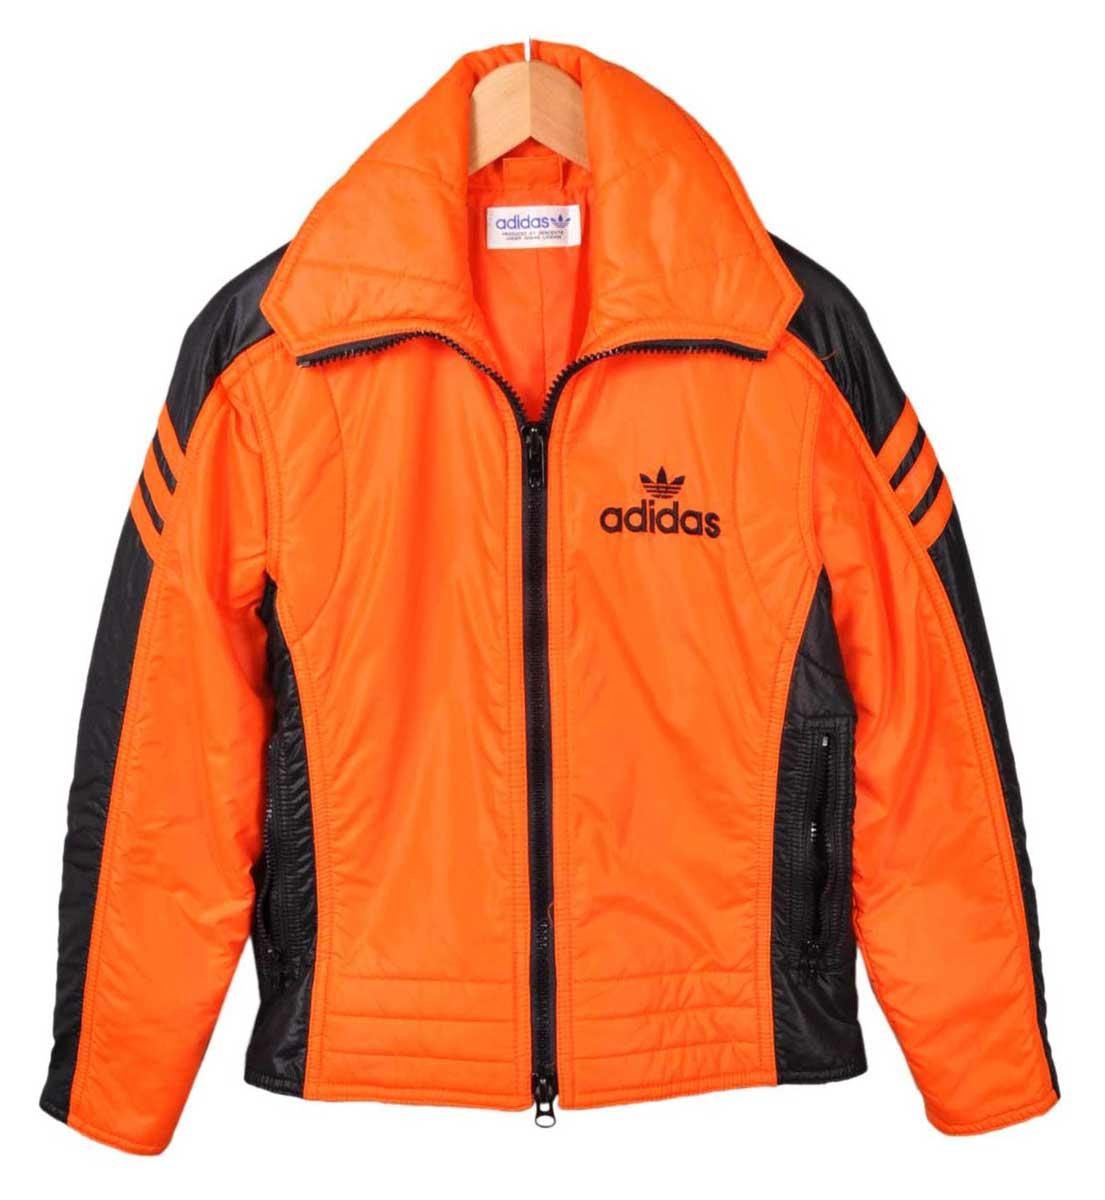 Vintage 1980 s   adidas adidas   ski jacket nylon jacket and orange x black    ladies S equivalent  23b7c708df67